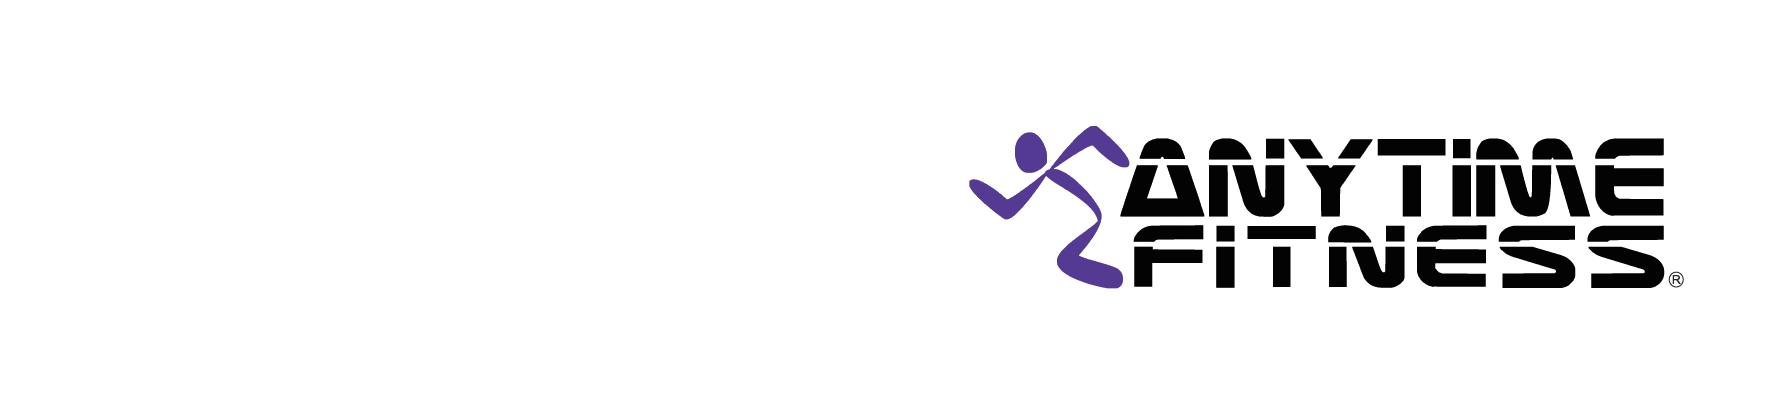 Graphics For Anytime Fitness Logo - 31.3KB